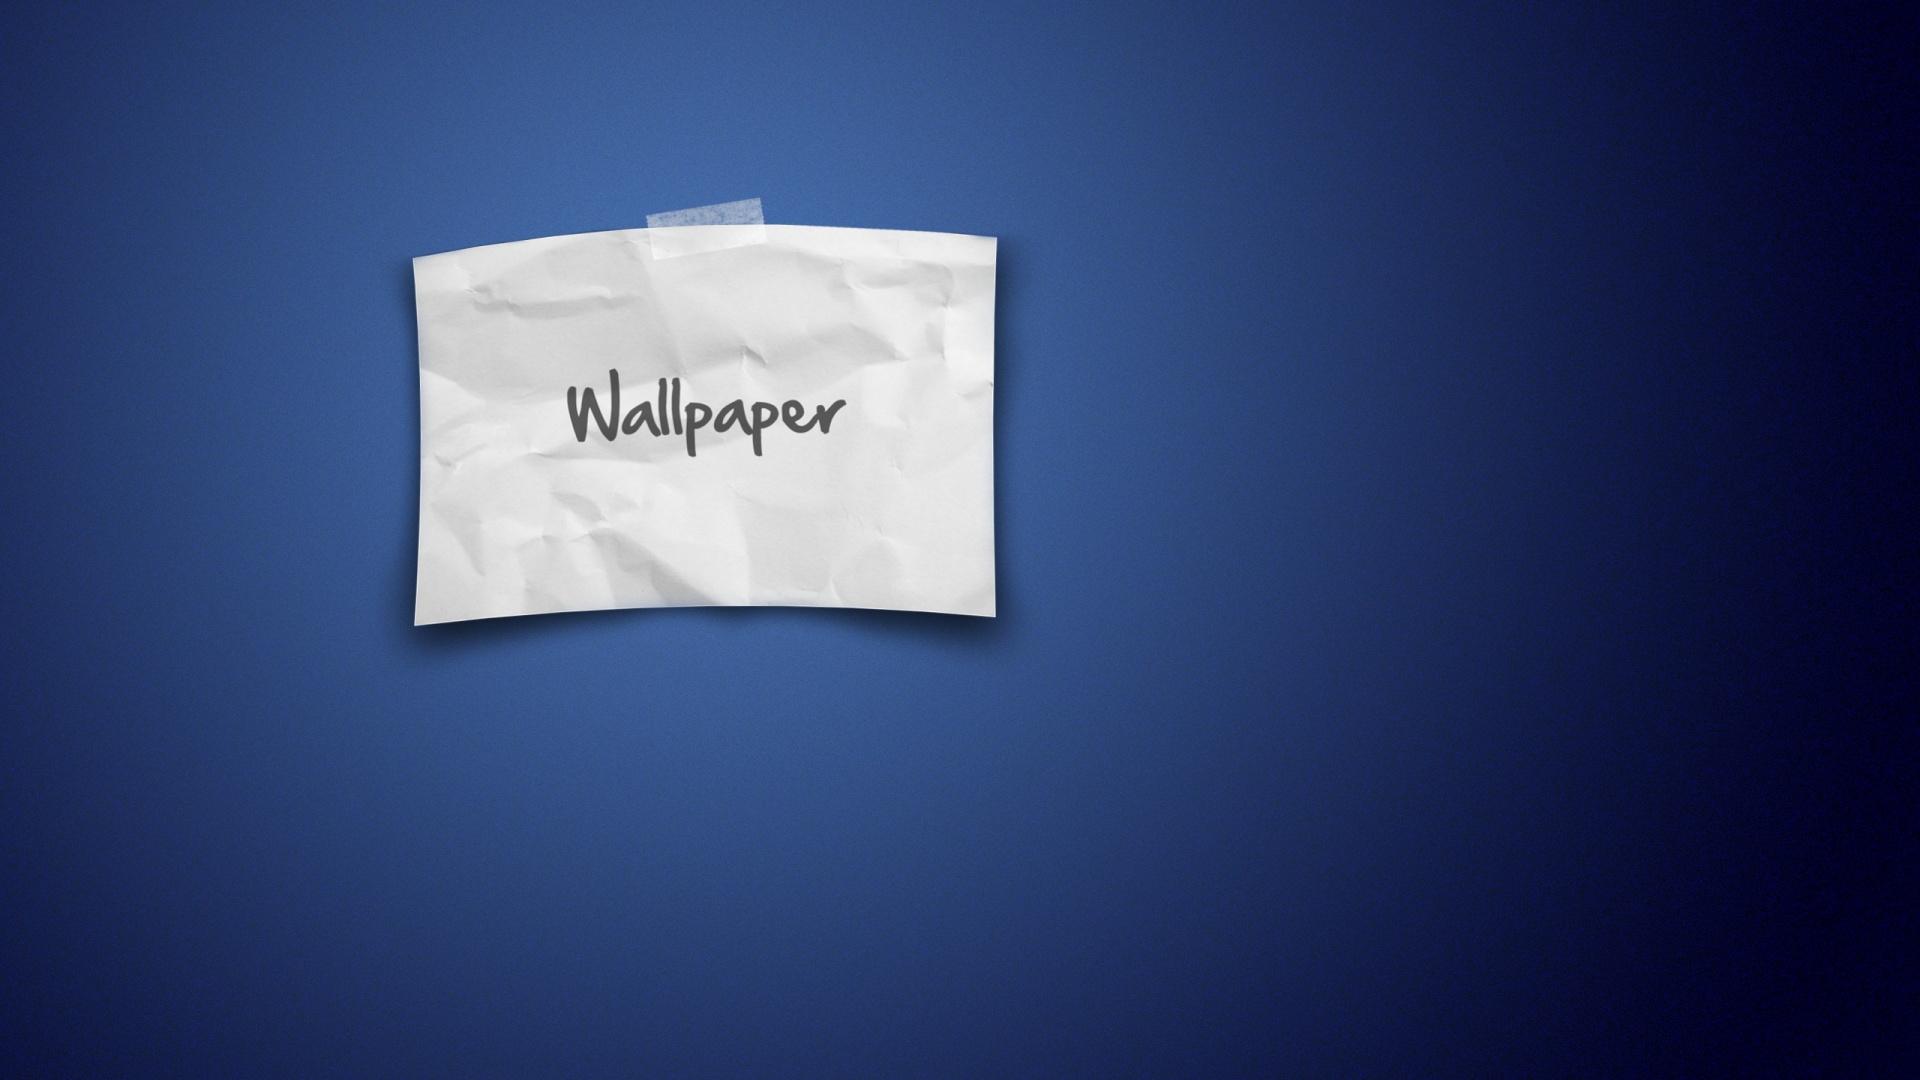 simple hd wallpaper - Tag | Download HD Wallpaperhd wallpapers